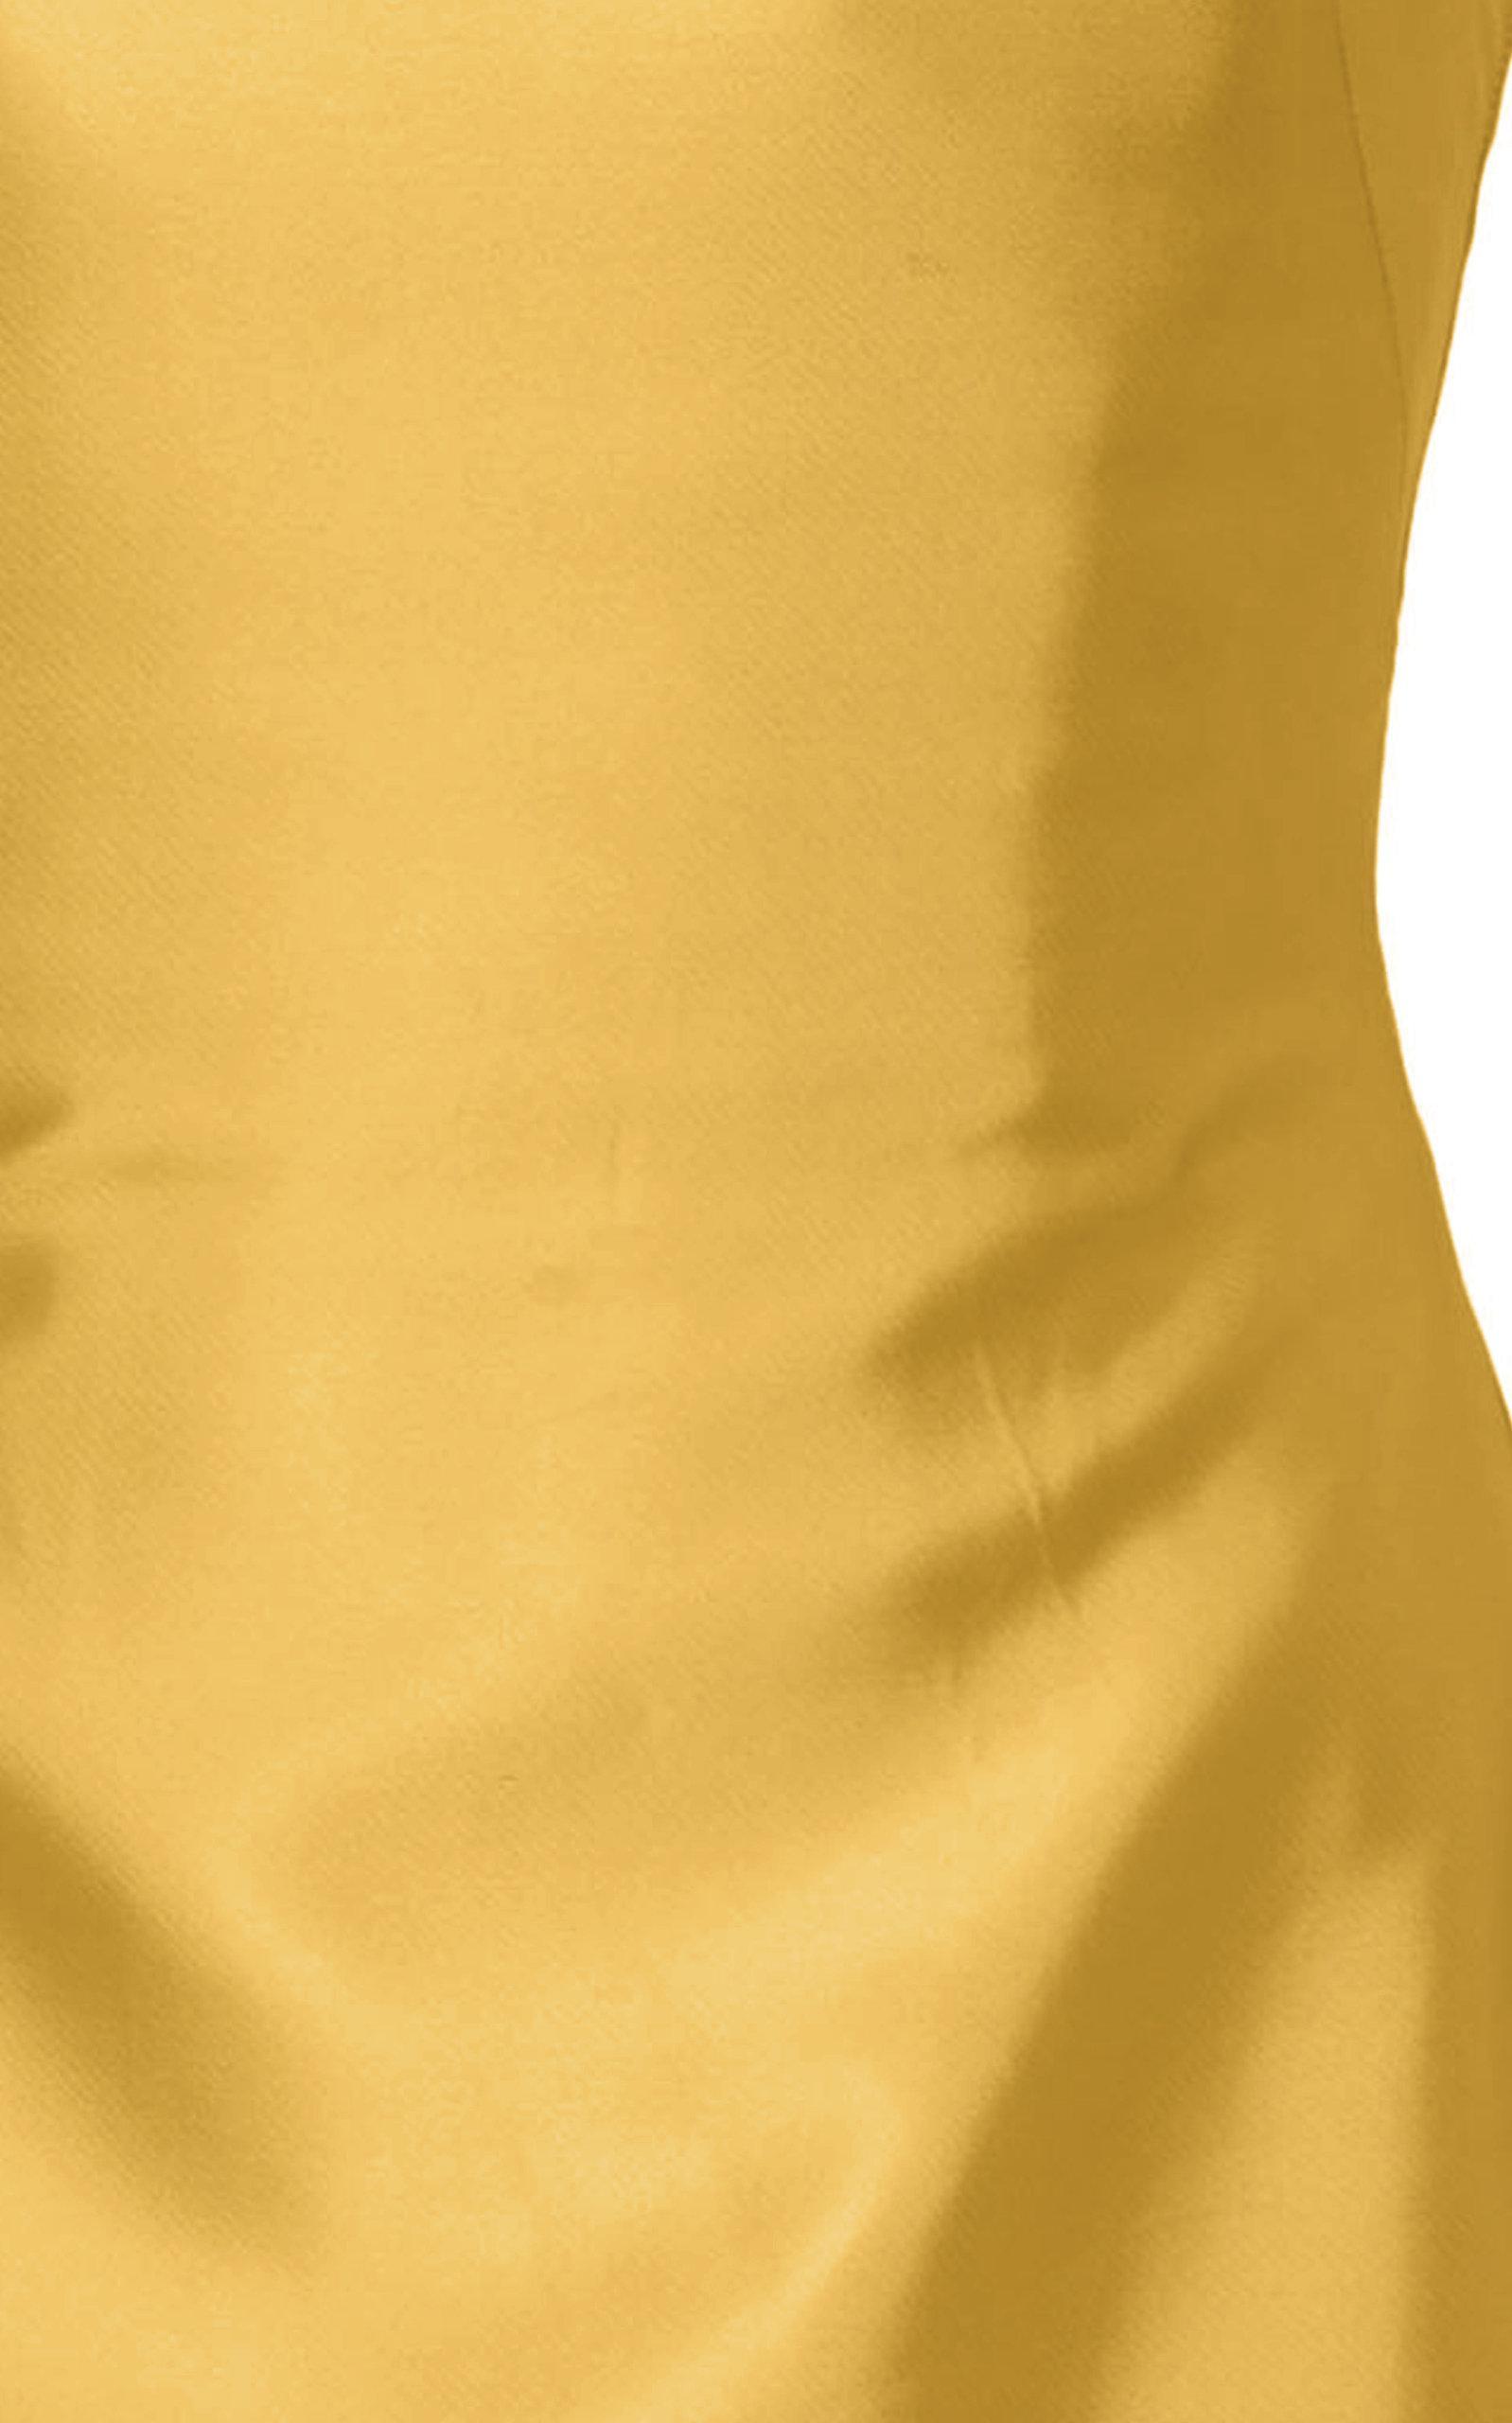 b464e649b7d Lyst - Brandon Maxwell Strapless Knotted-back Satin Cocktail Dress ...